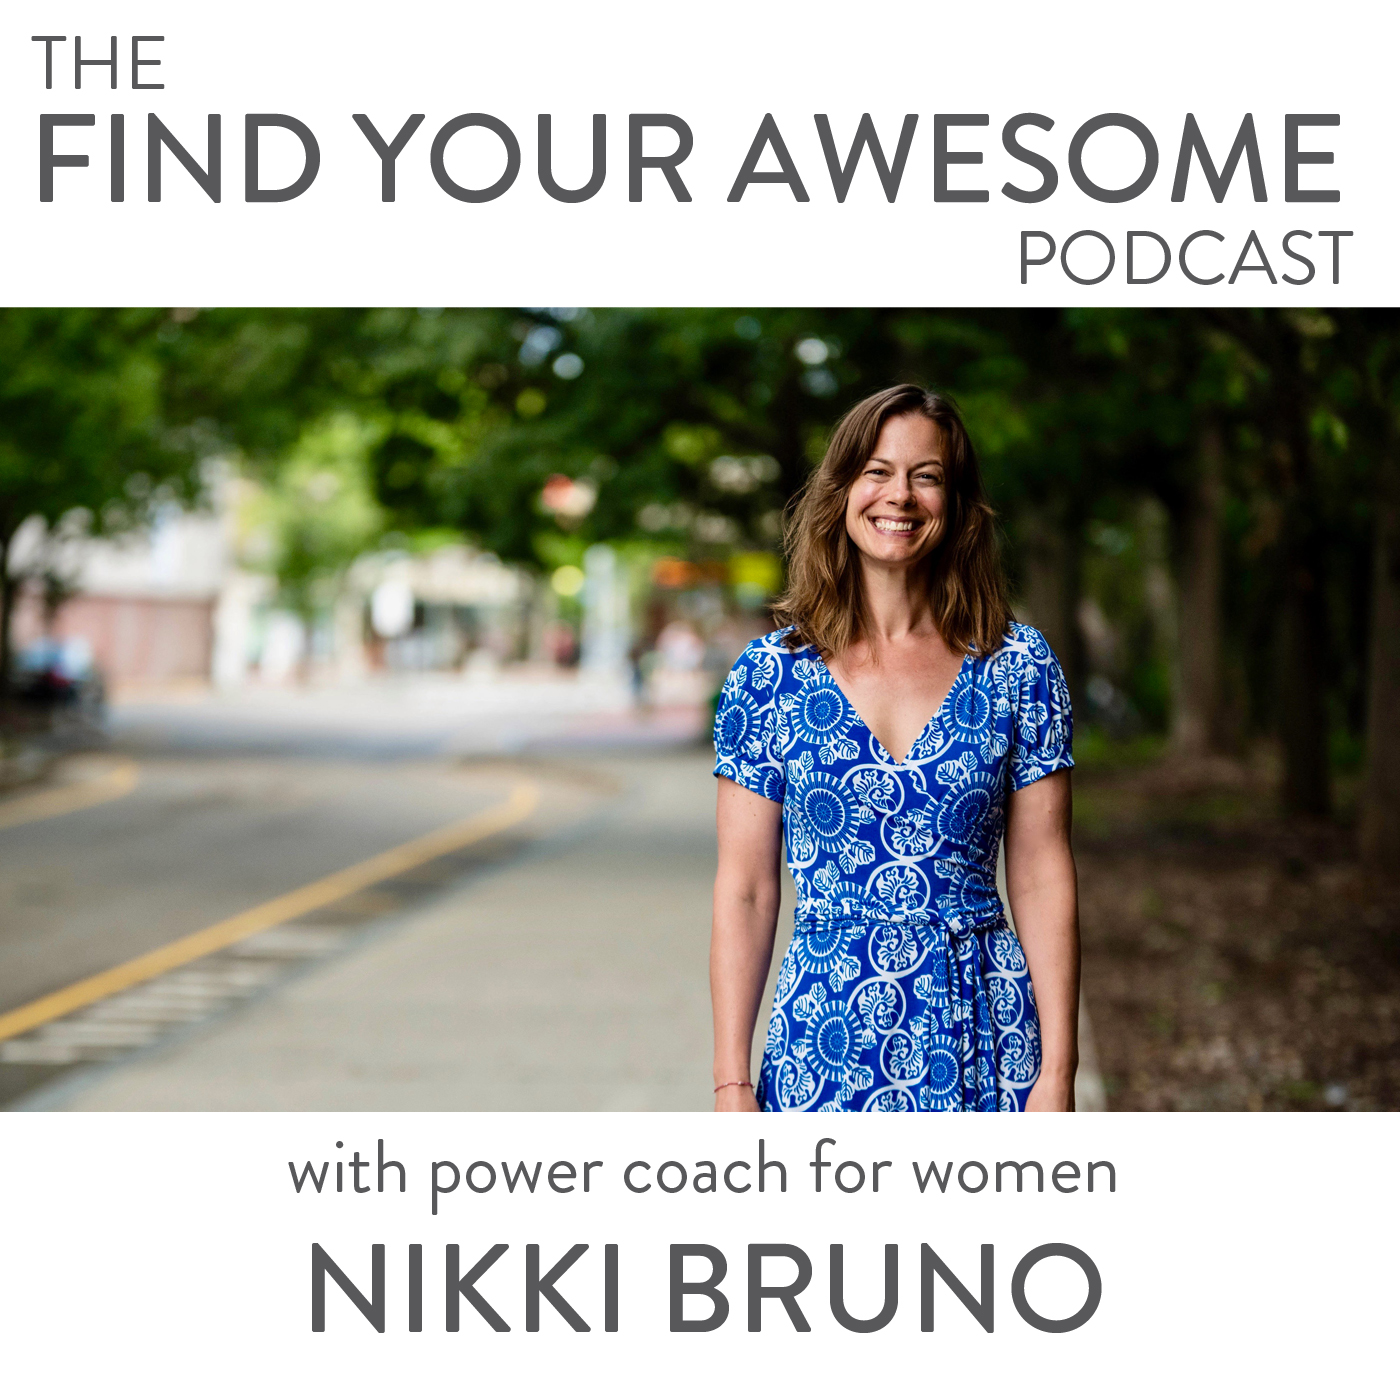 NikkiBruno_podcast_coverart.jpg